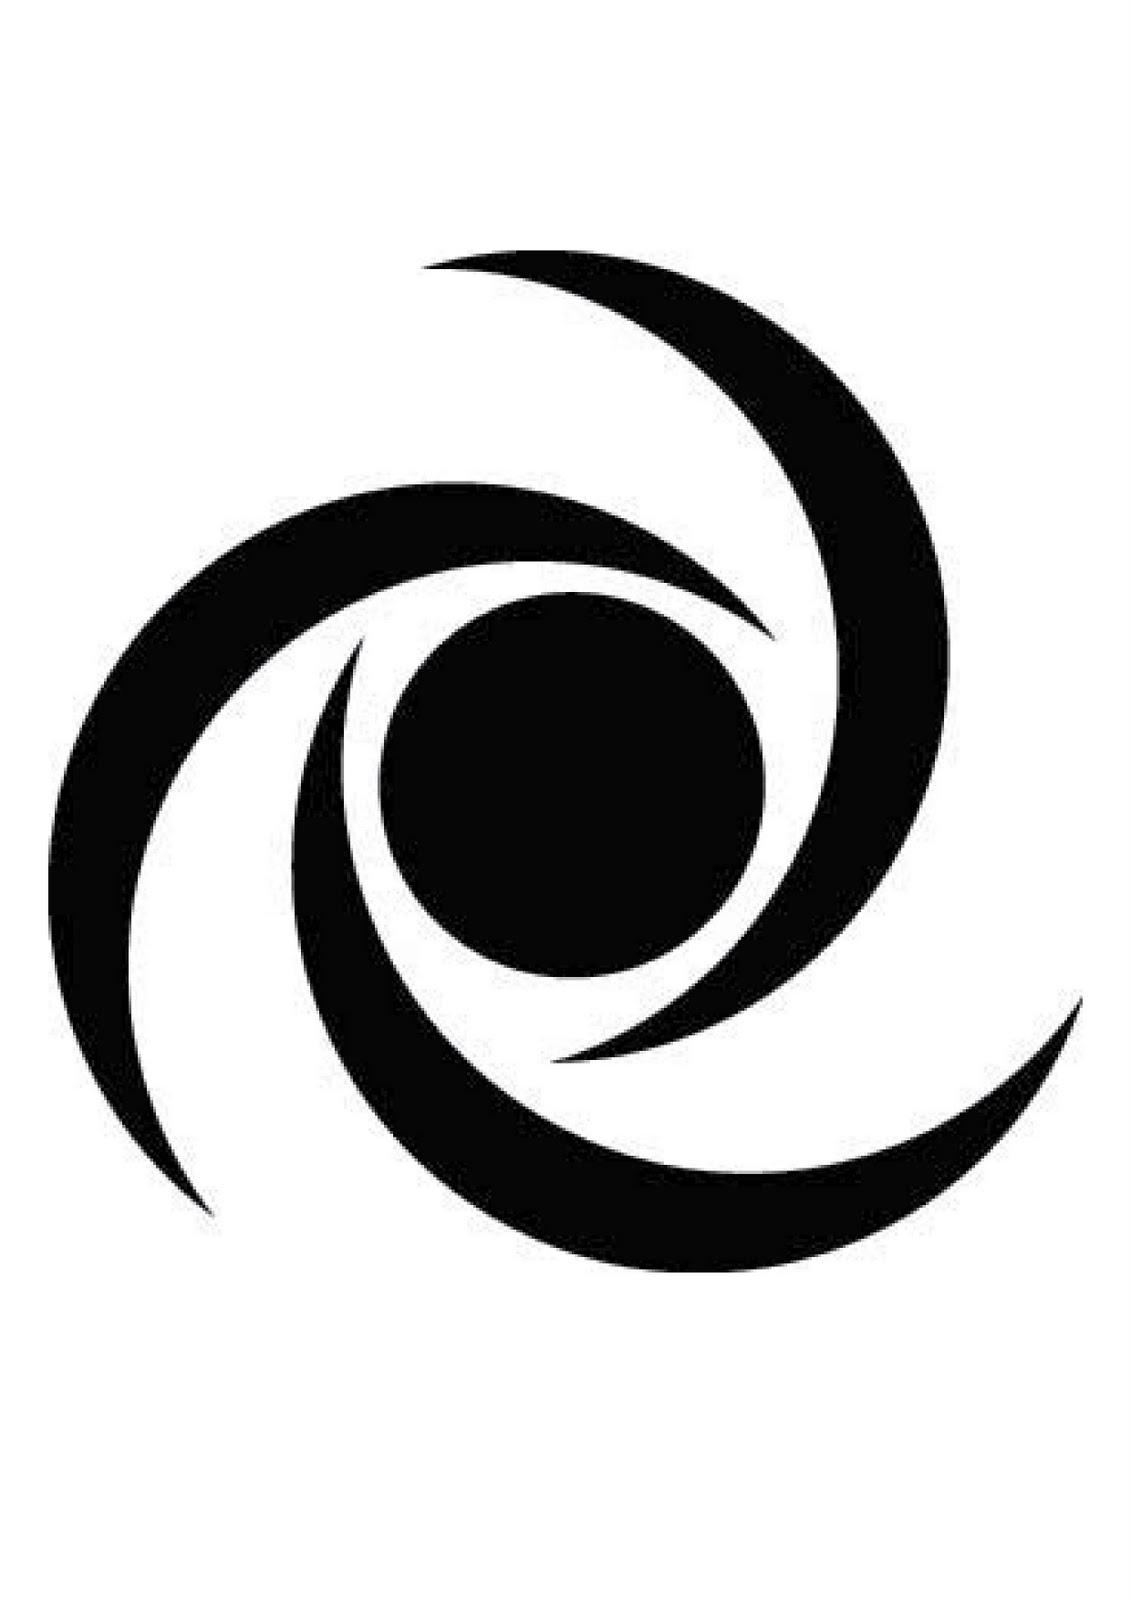 Jaykim Symbols And Distribution